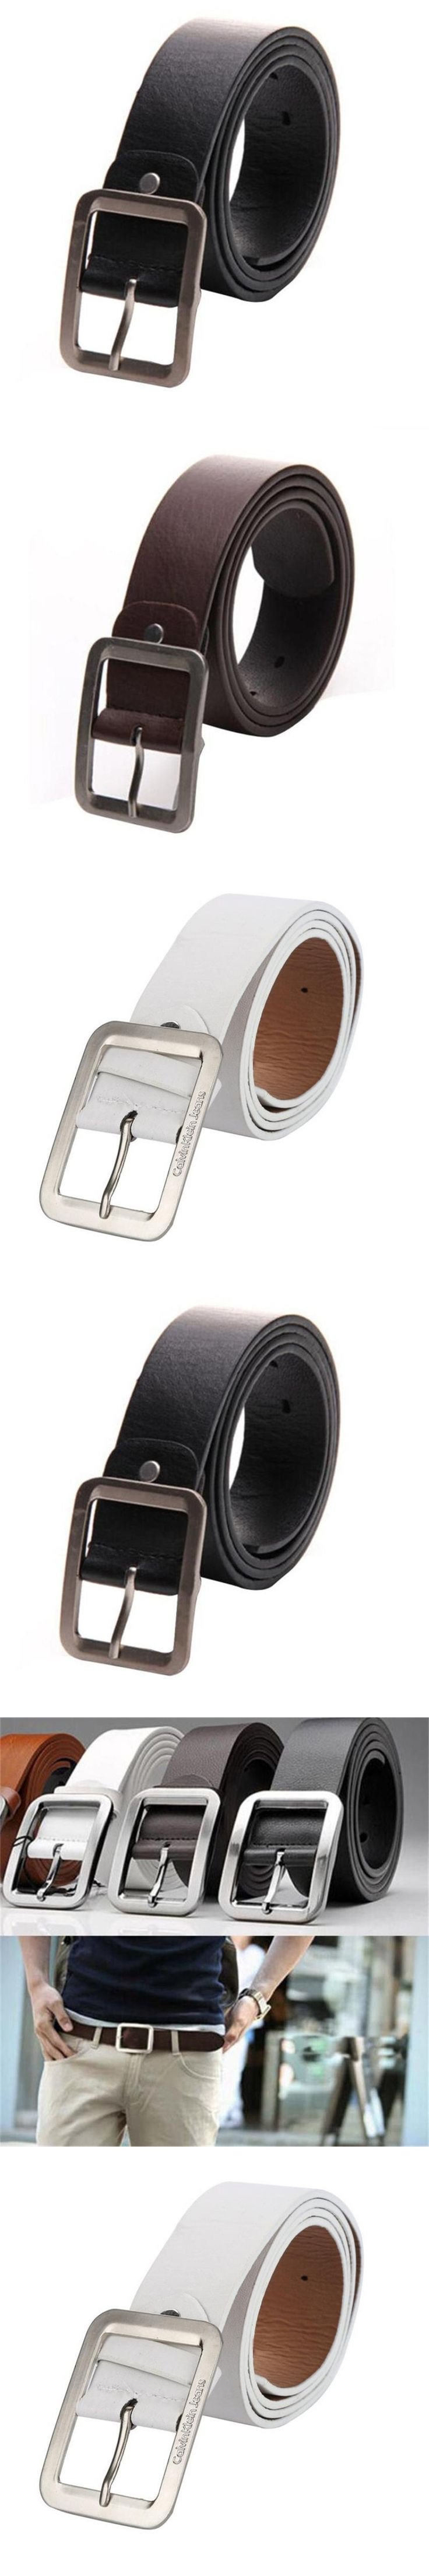 2017 New Style Men's Casual Faux Leather Belt Buckle Waist Strap Belts leather belts for men high quality ceinture homme riem